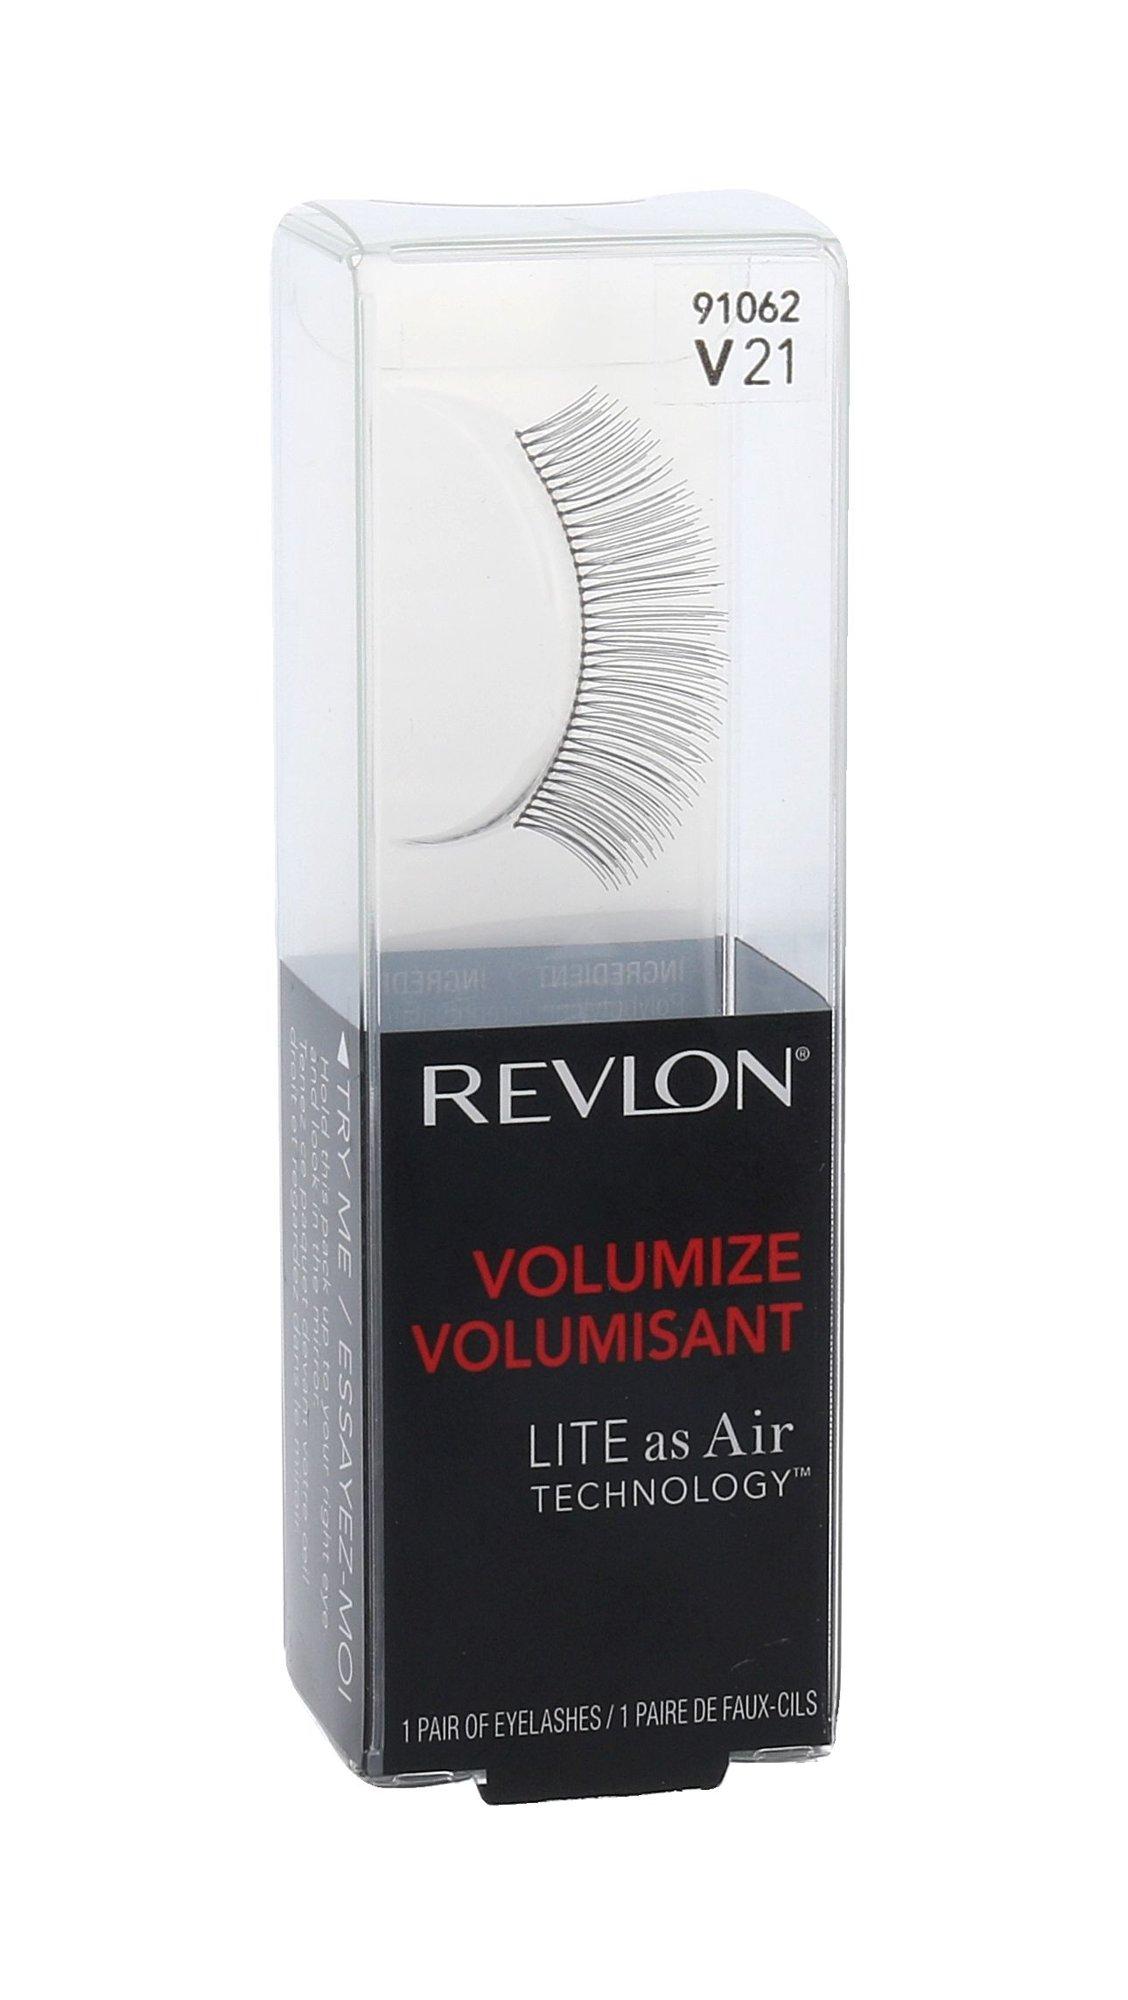 Revlon Volumize Cosmetic 1ml